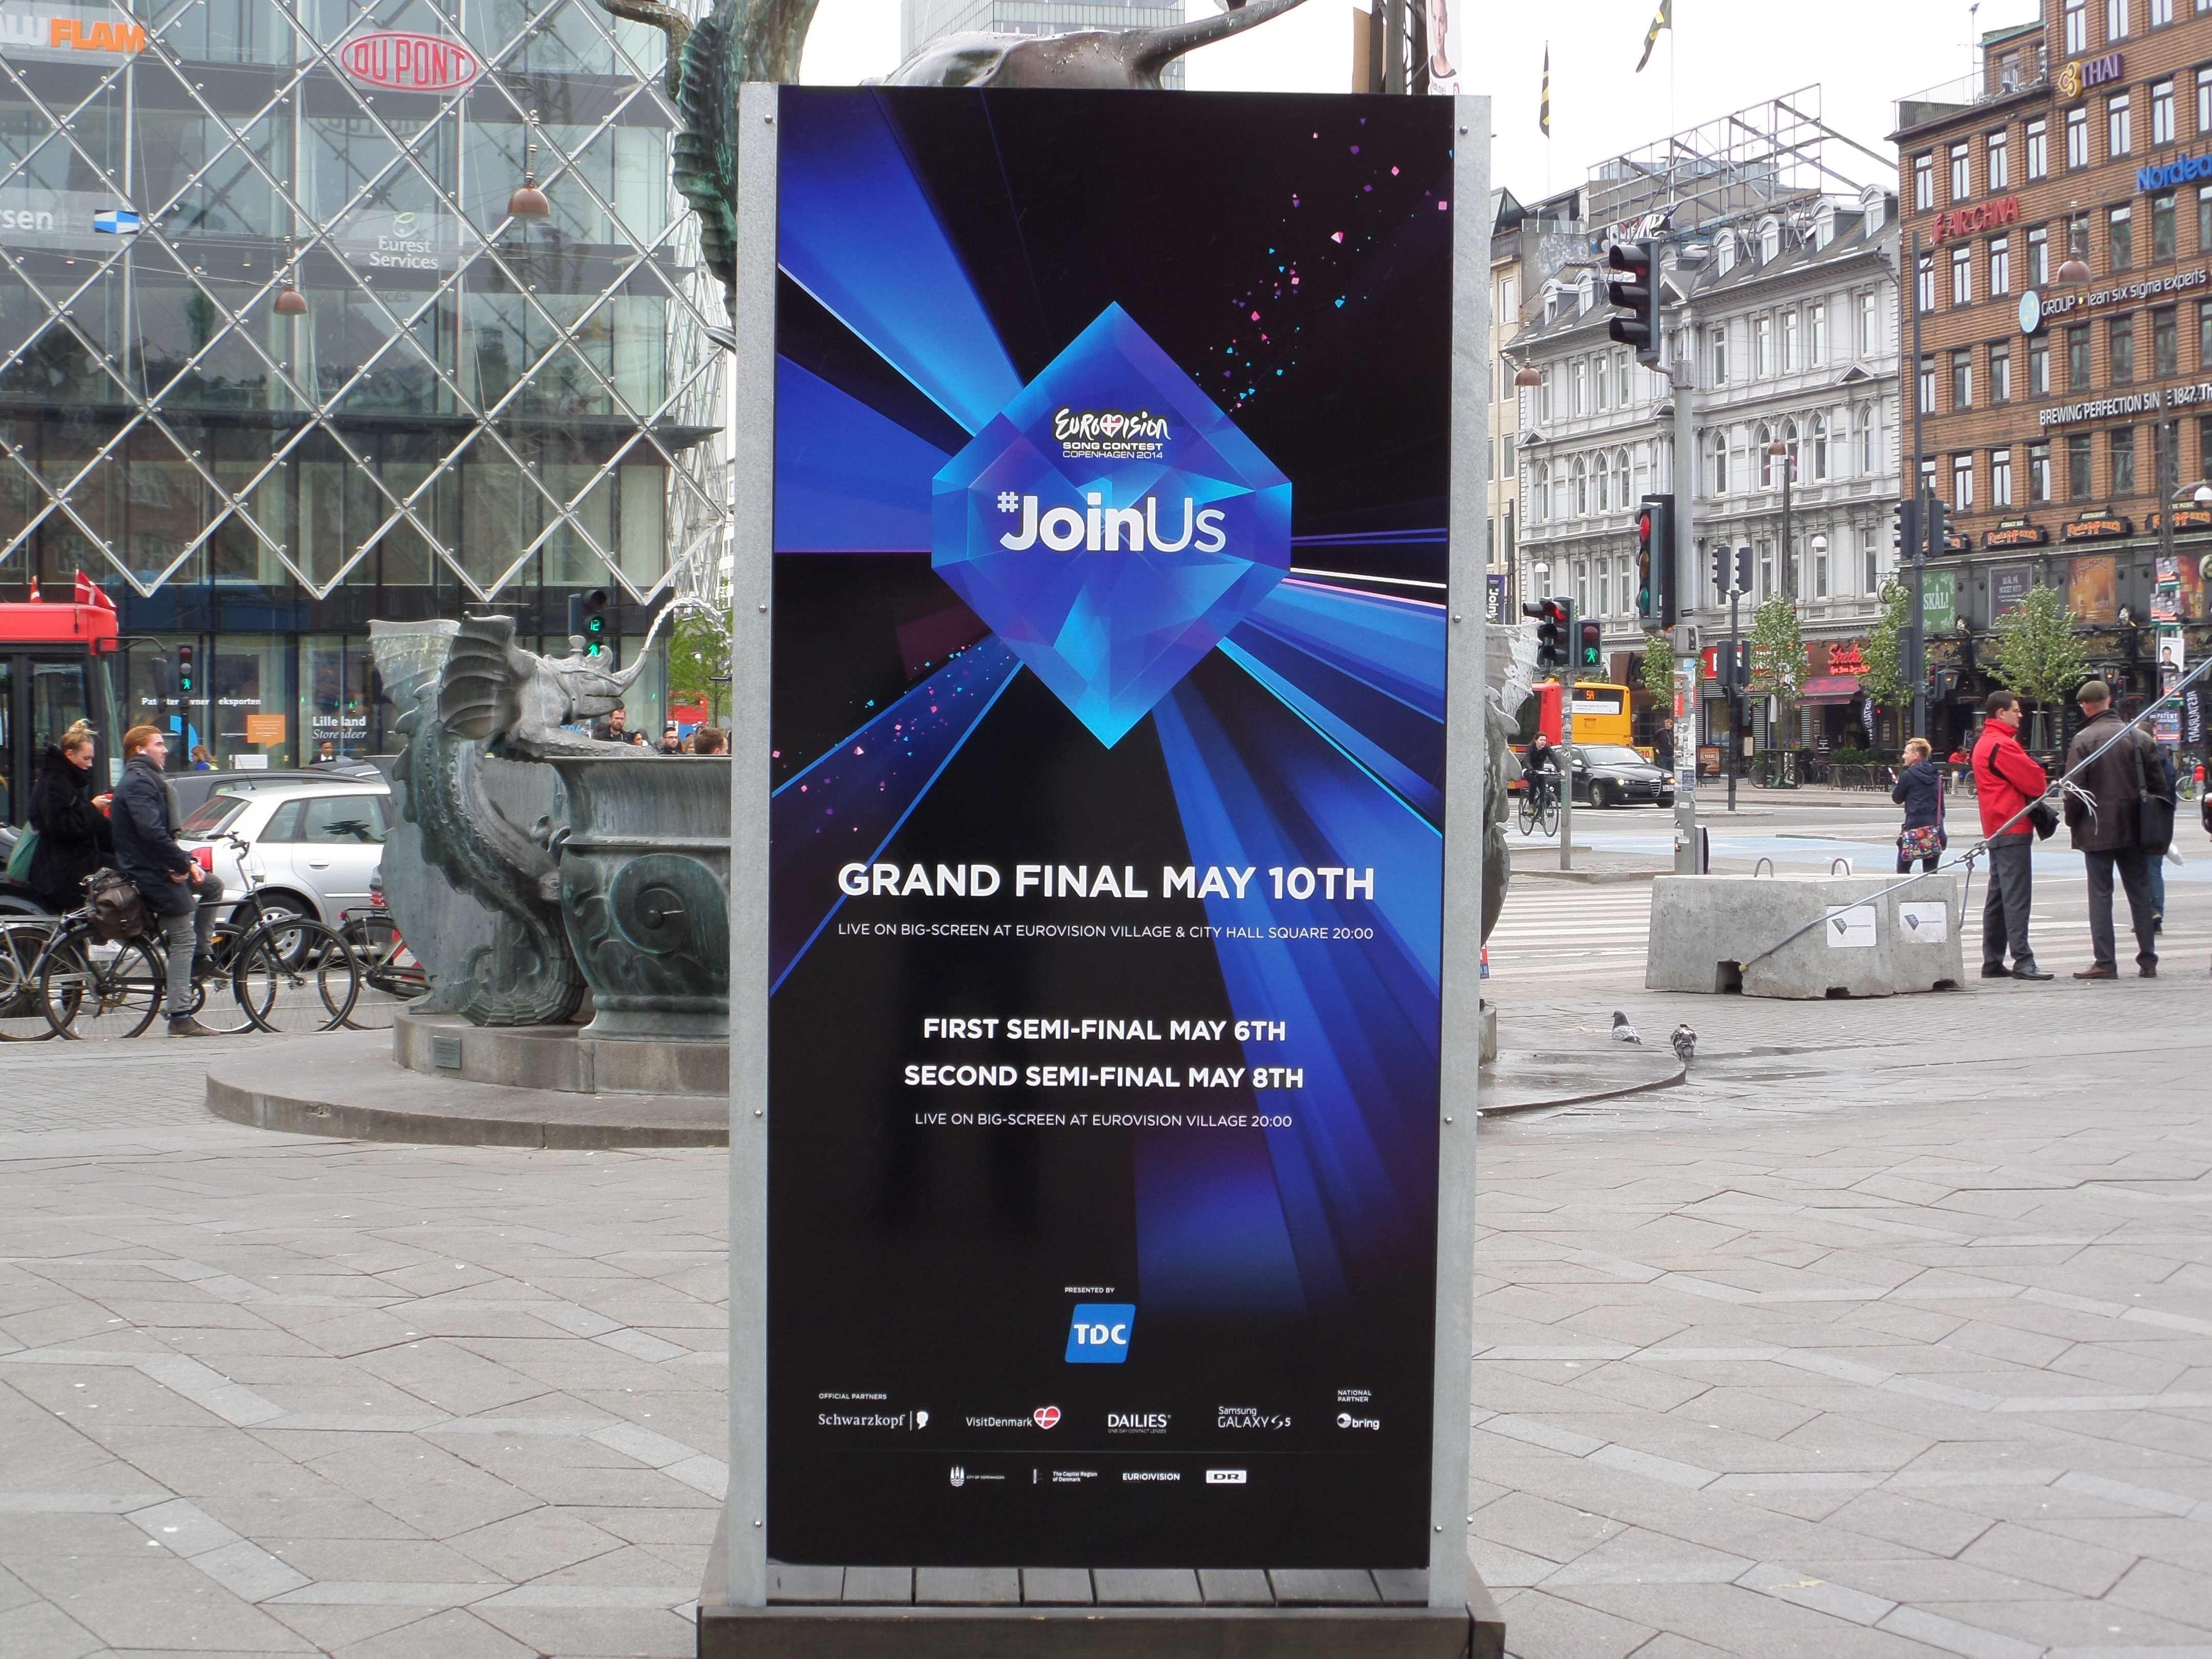 Plakat auf dem Kopenhagener Rathausplatz (59. Eurovision Song Contest 2014). Das Motto dieses ESC war '#JoinUs'.